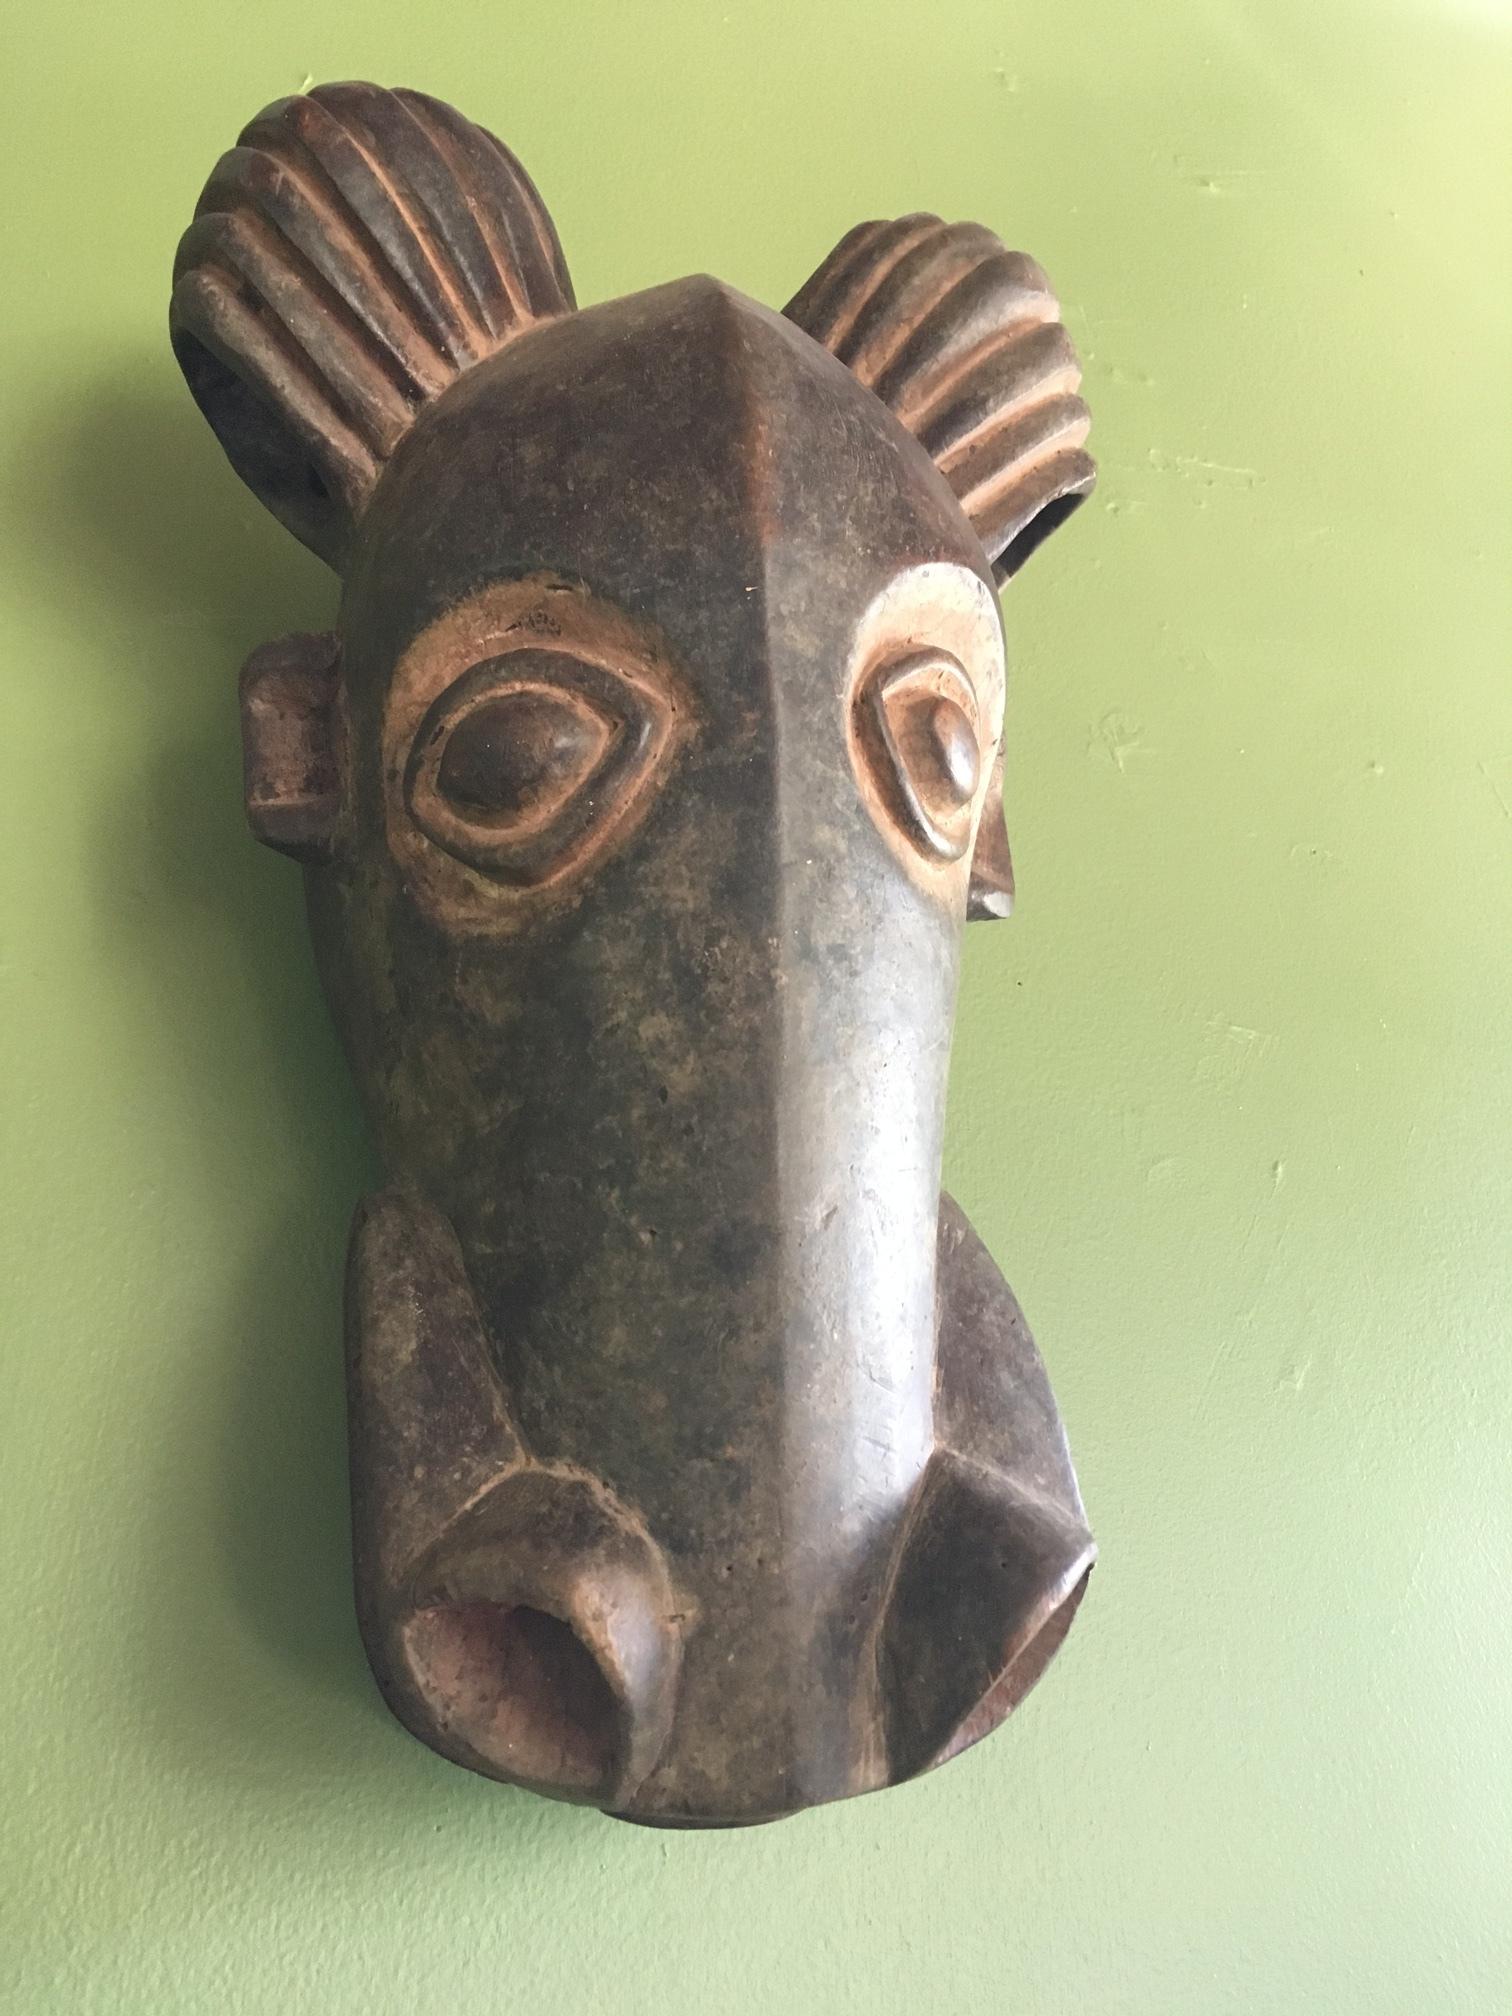 Bamileke mask, hand-carved, Cameroon